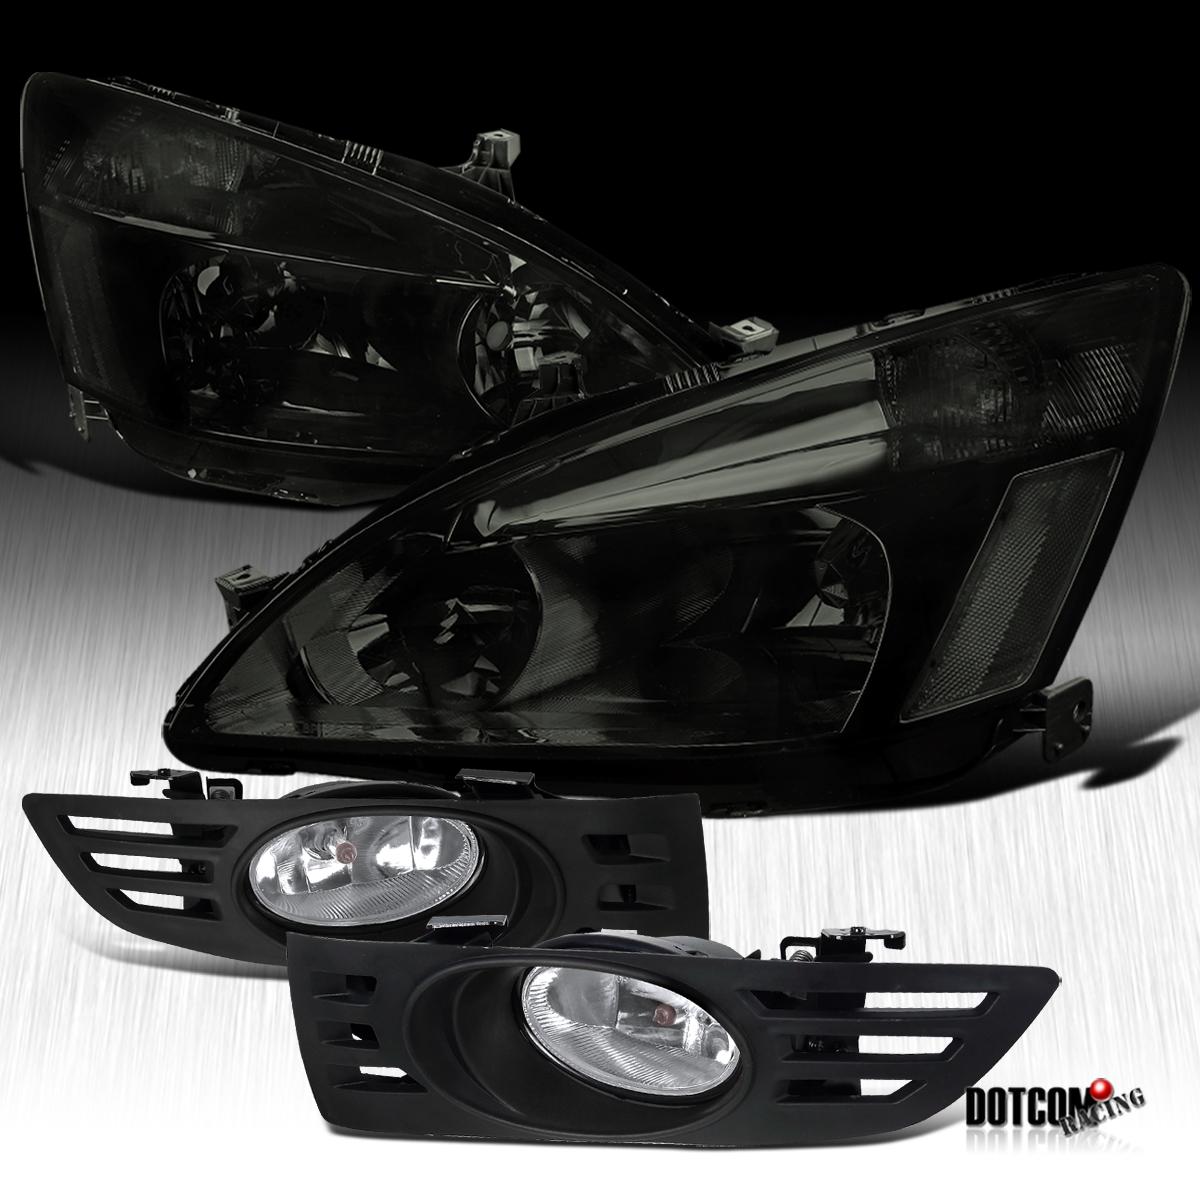 honda 03-05 accord 2dr coupe jdm smoke tint headlight ... 2003 honda accord stereo wiring diagram #15